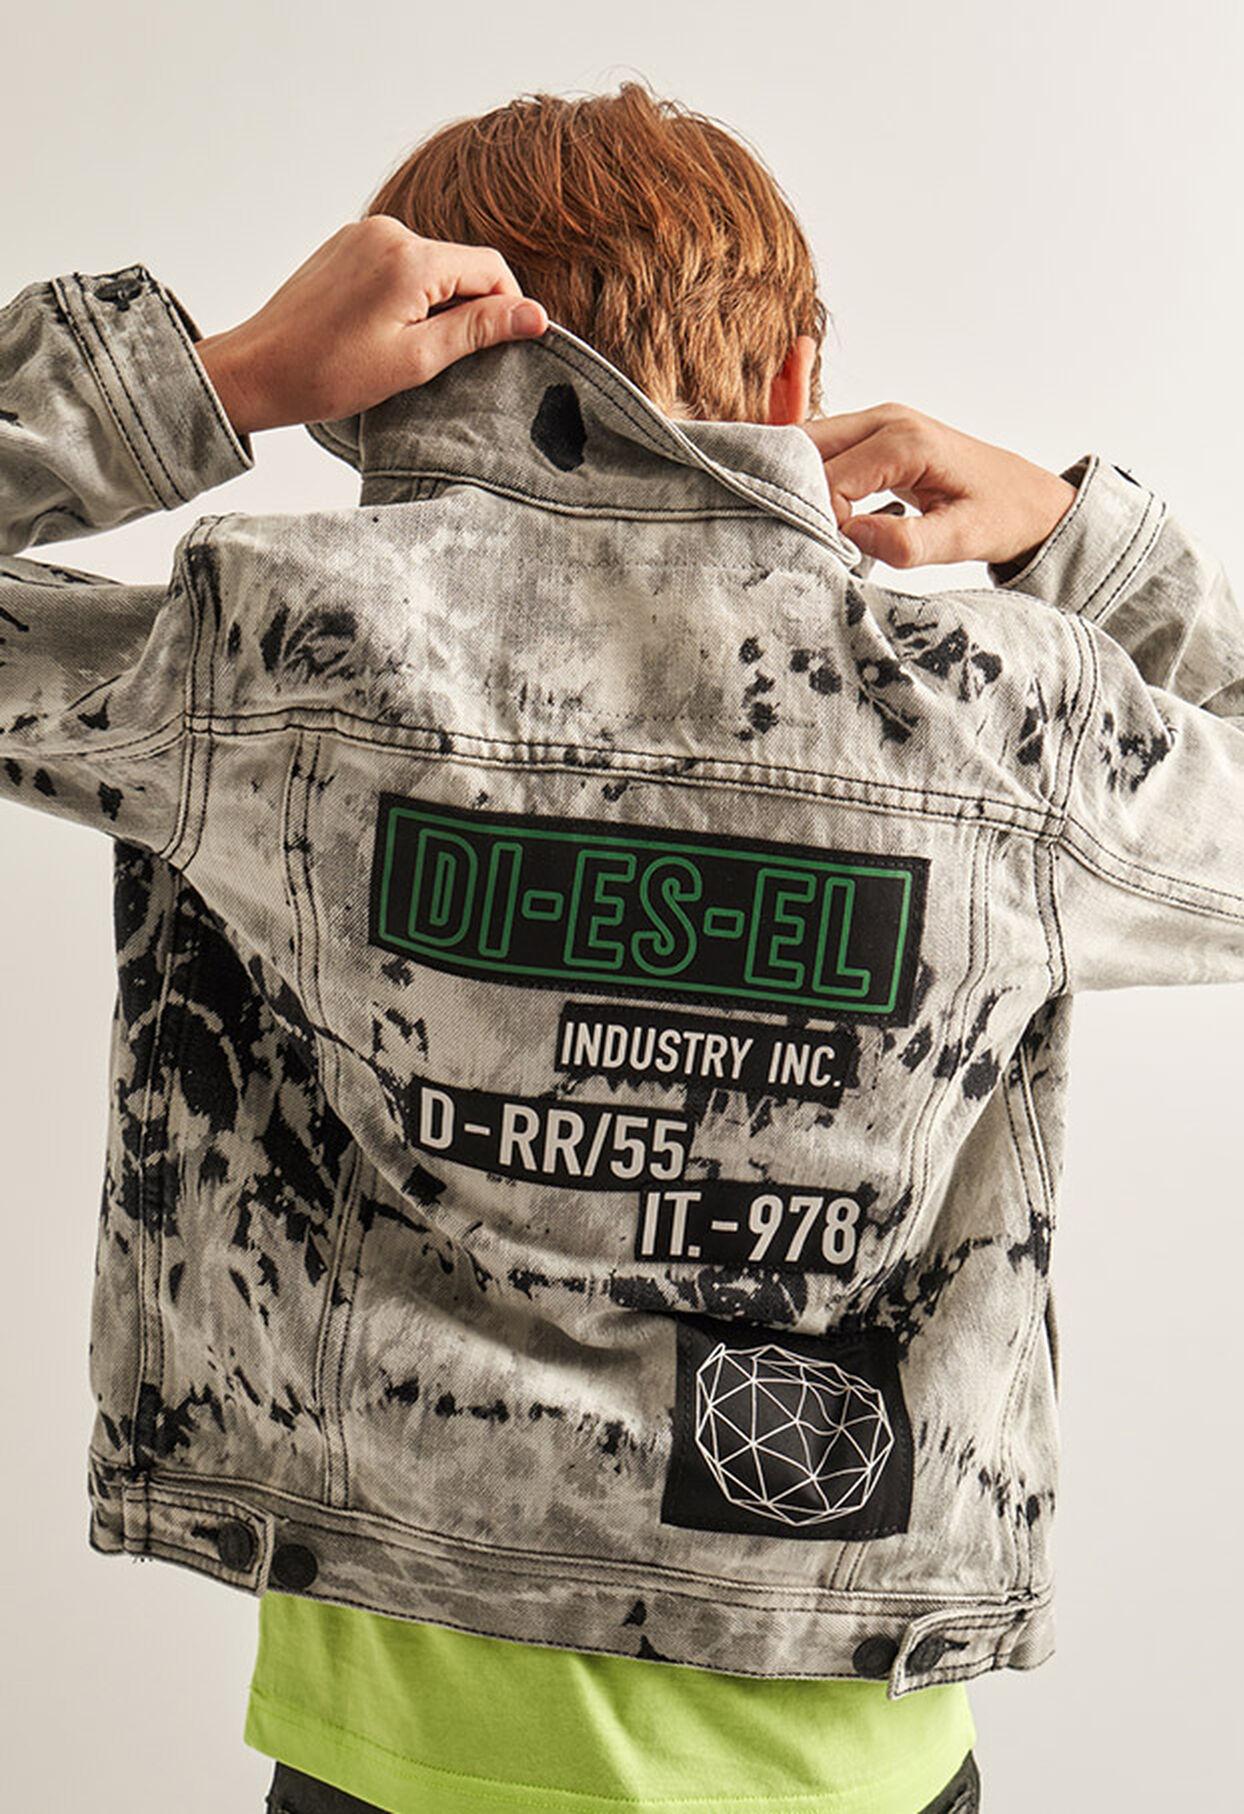 https://nl.diesel.com/dw/image/v2/BBLG_PRD/on/demandware.static/-/Library-Sites-DieselMFSharedLibrary/default/dw9fd09078/CATEGORYOV/2x2_90.jpg?sw=1244&sh=1814